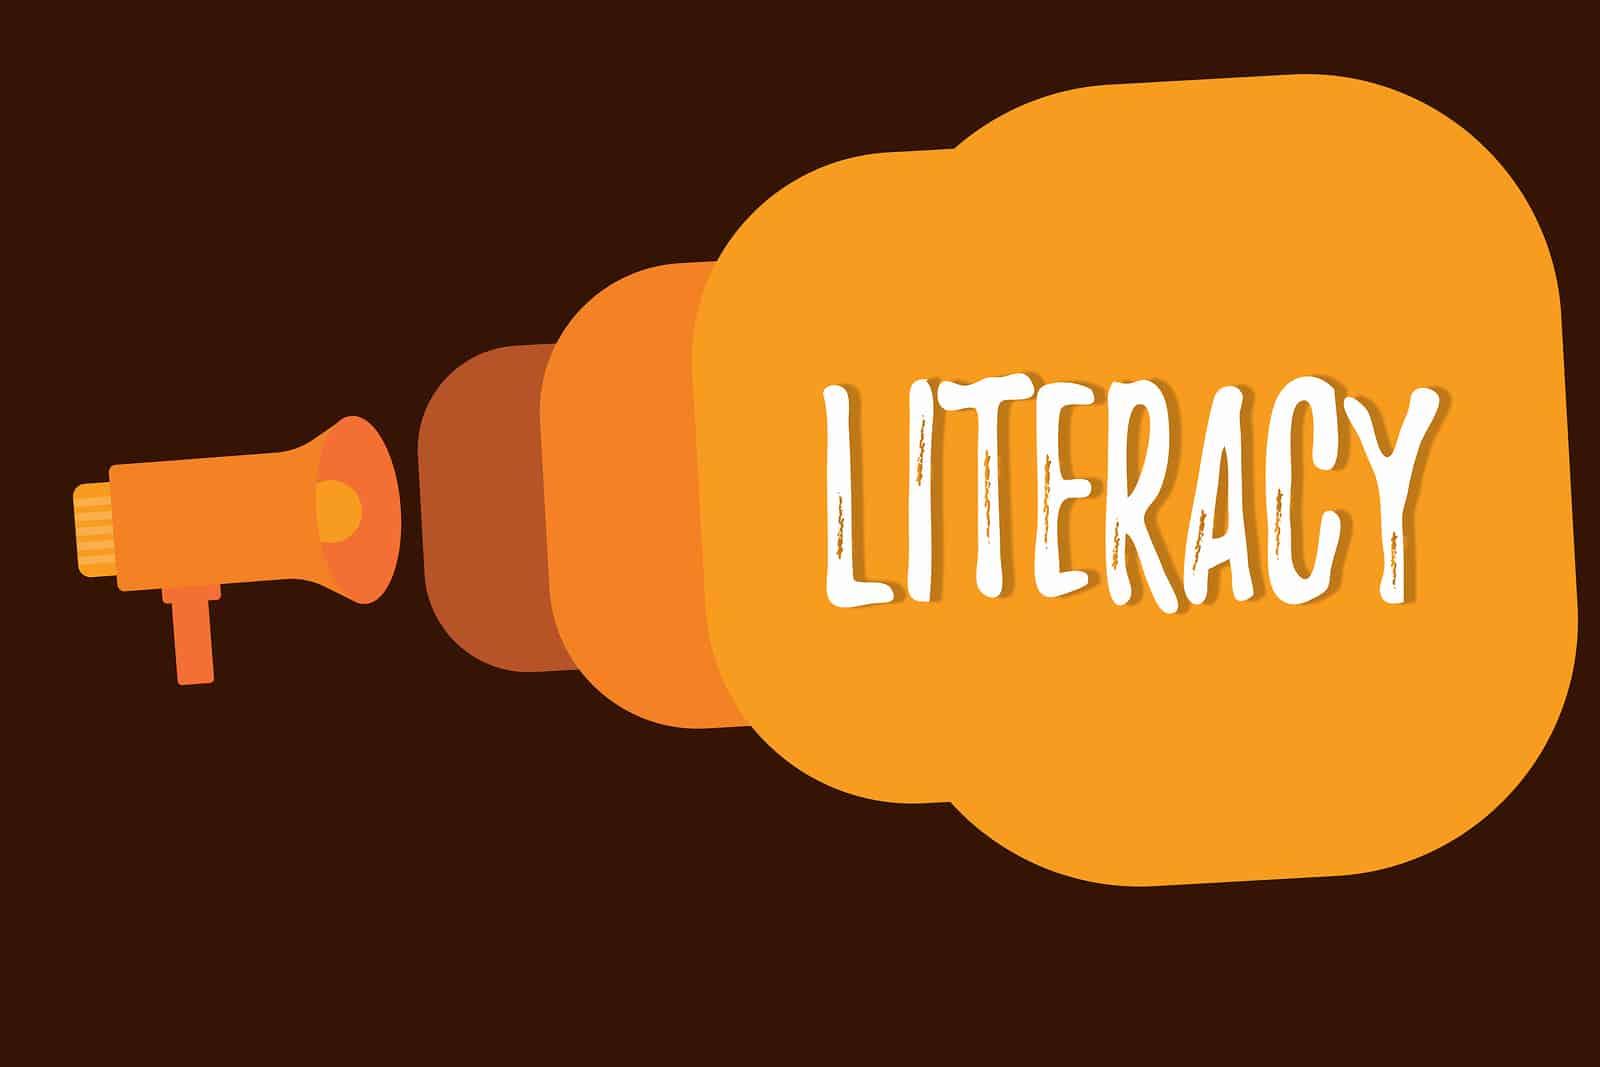 EDUCATION IN MEDIA LITERACY